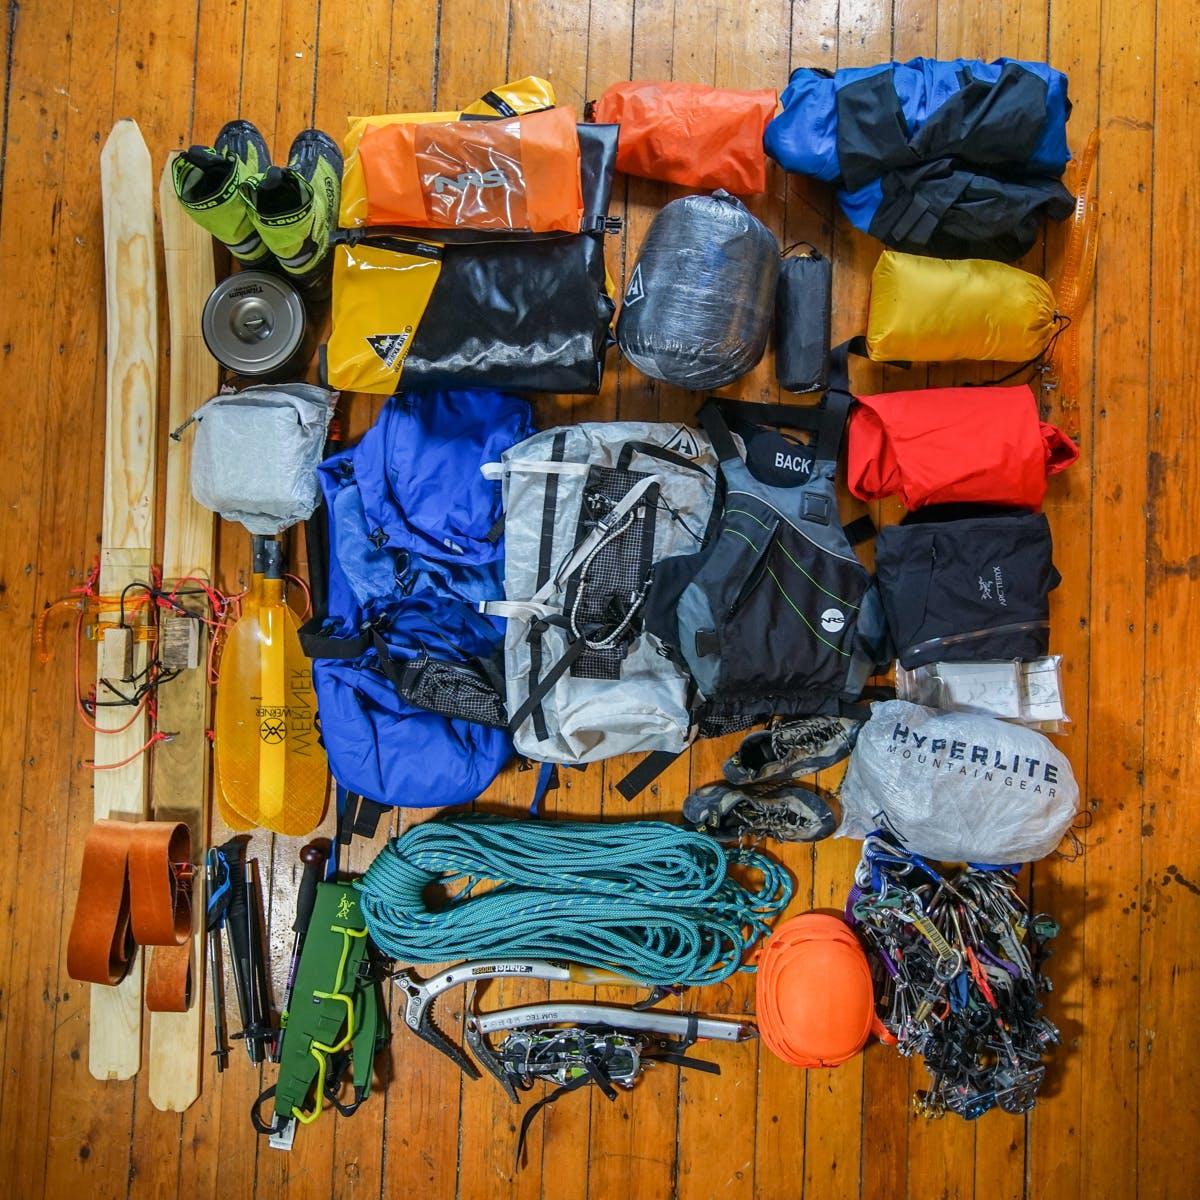 Adventurer and artist Craig Muderlak took a pretty extensive amount of gear on his multi-sport (ski, hike, packraft, climb) adventure to Alaska in 2016.